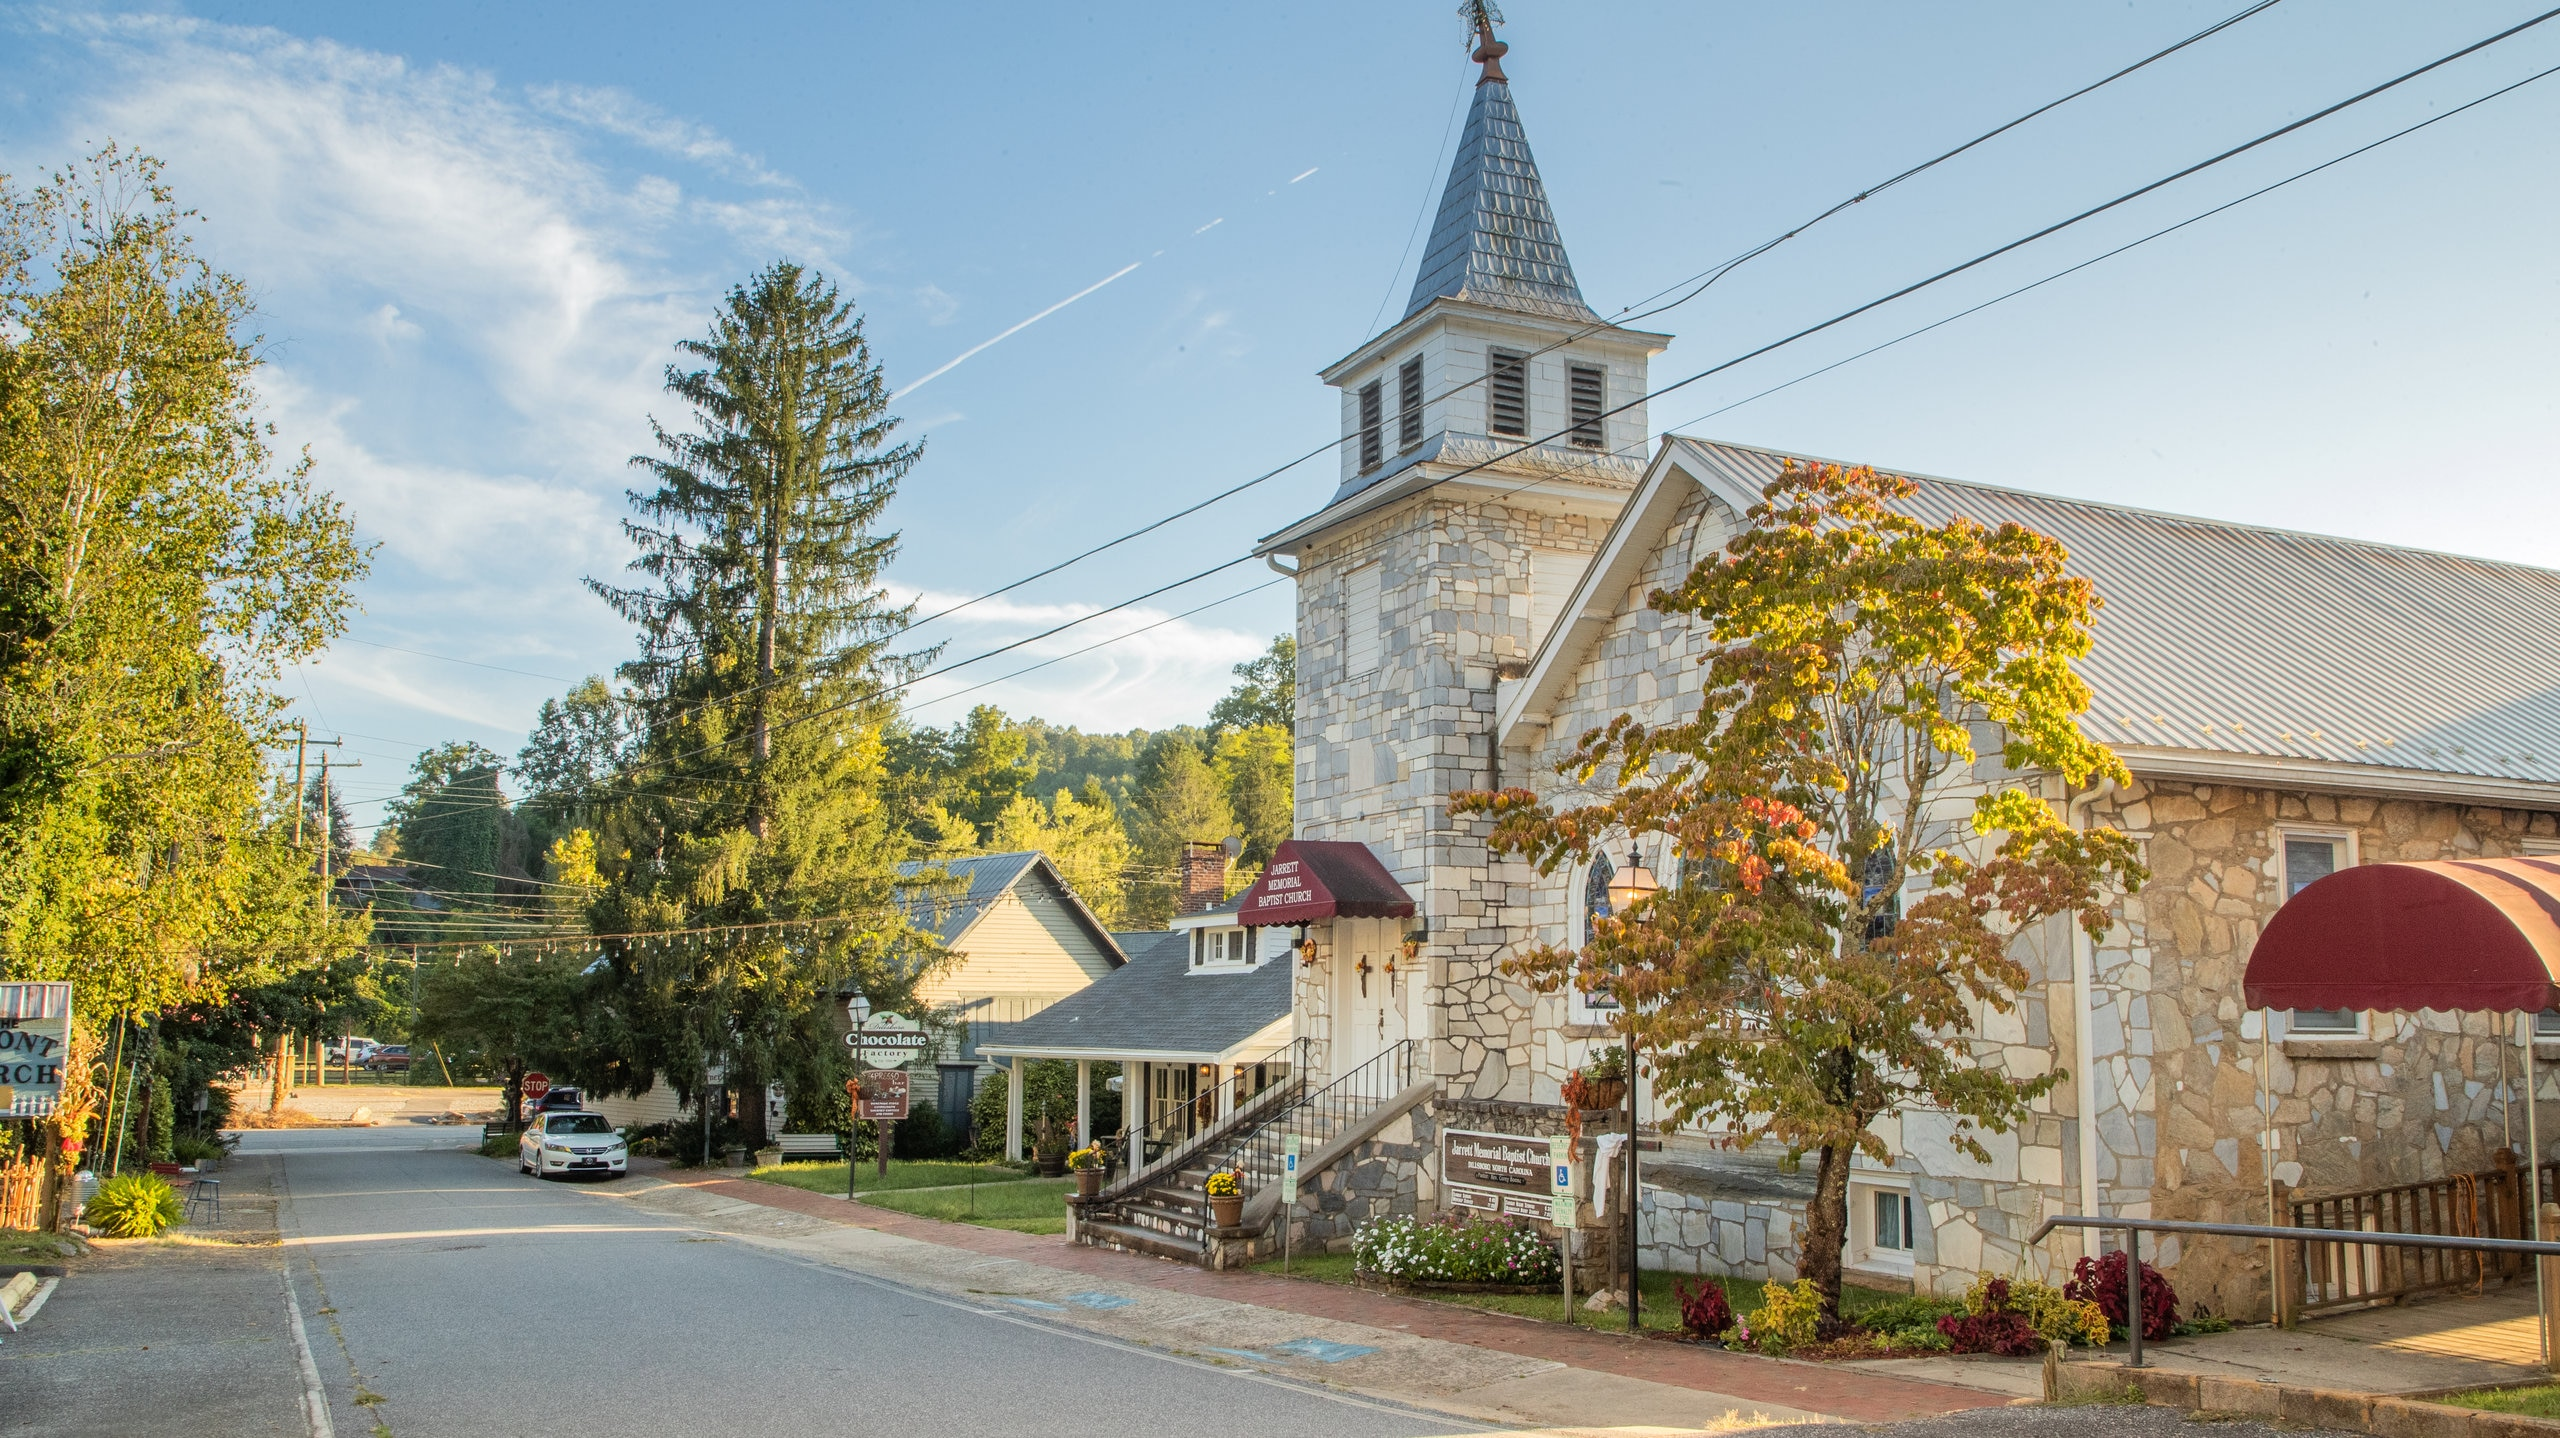 Sylva, North Carolina, United States of America